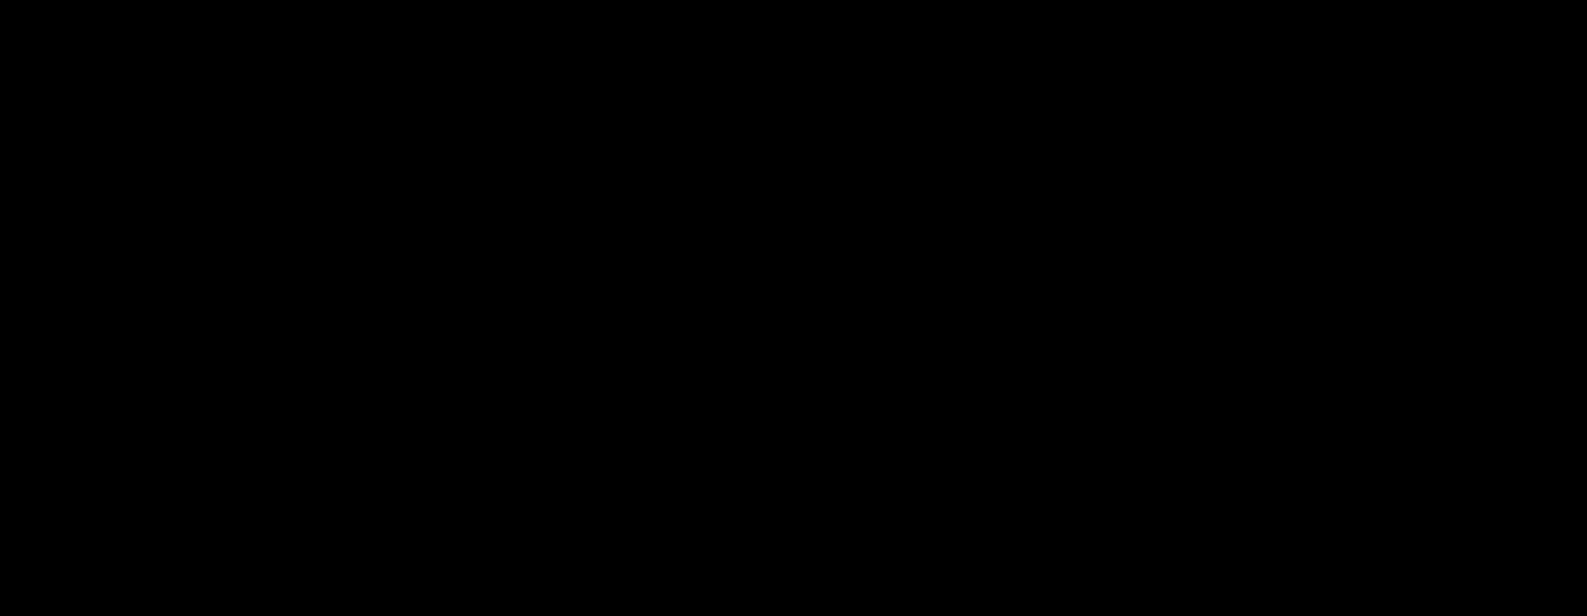 Desmethyl levosulpiride